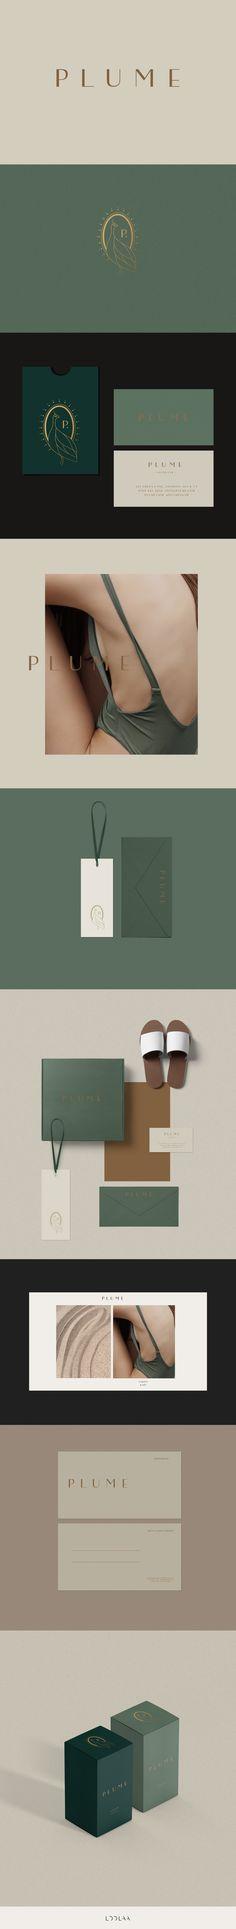 Plume- branding package- available | Loolaa Designs